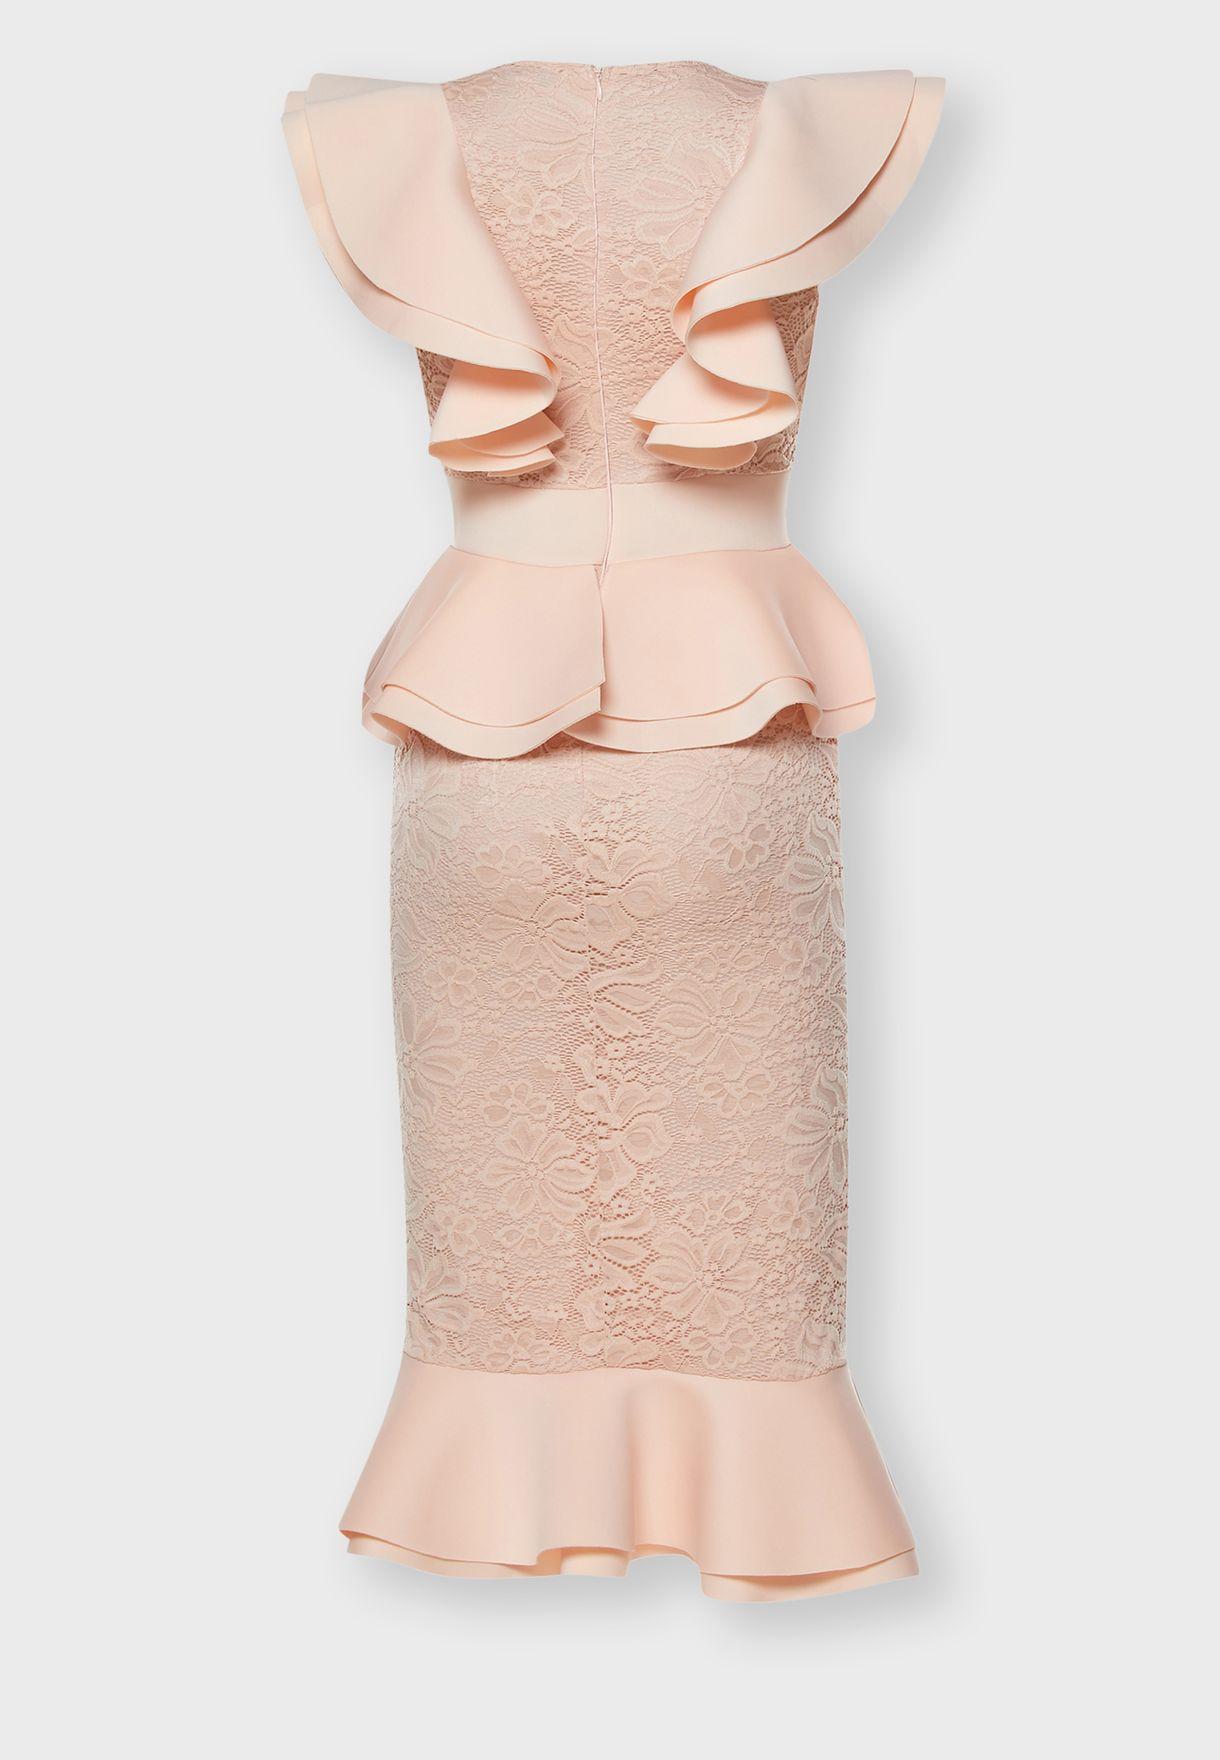 فستان ضيق بحمالات كشكش